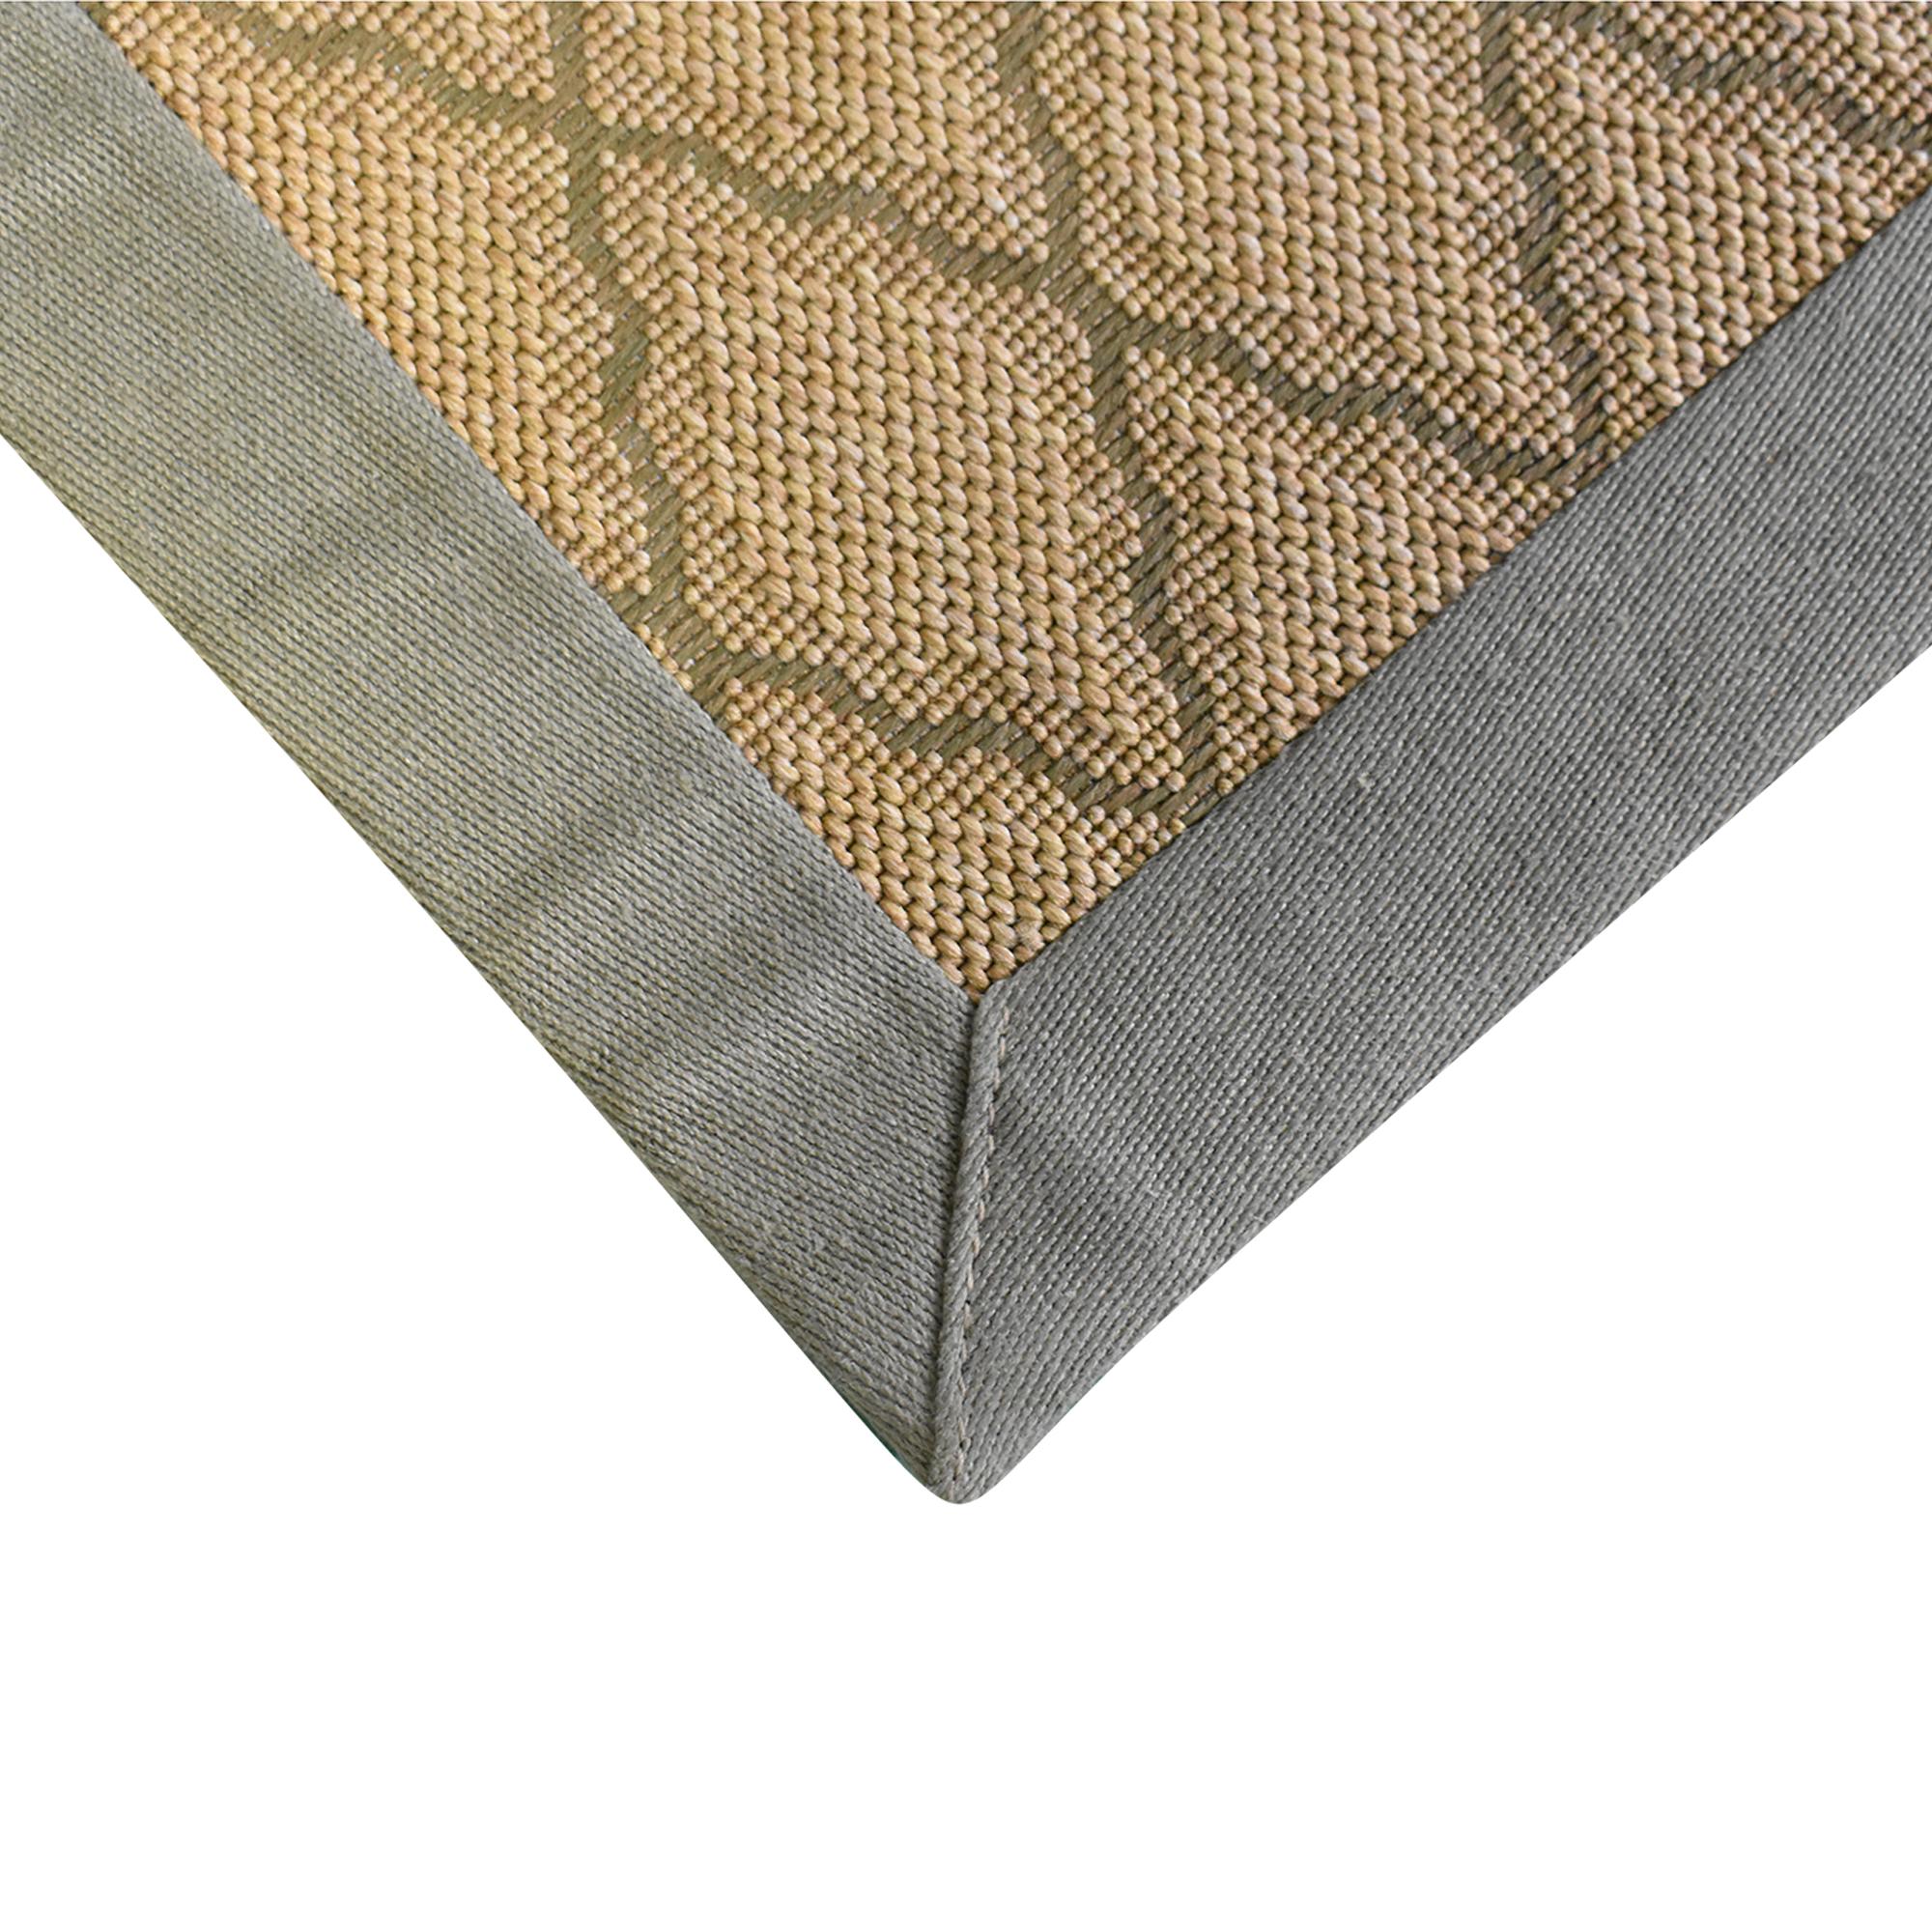 ABC Carpet & Home ABC Carpet & Home Seychelles Area Rug coupon